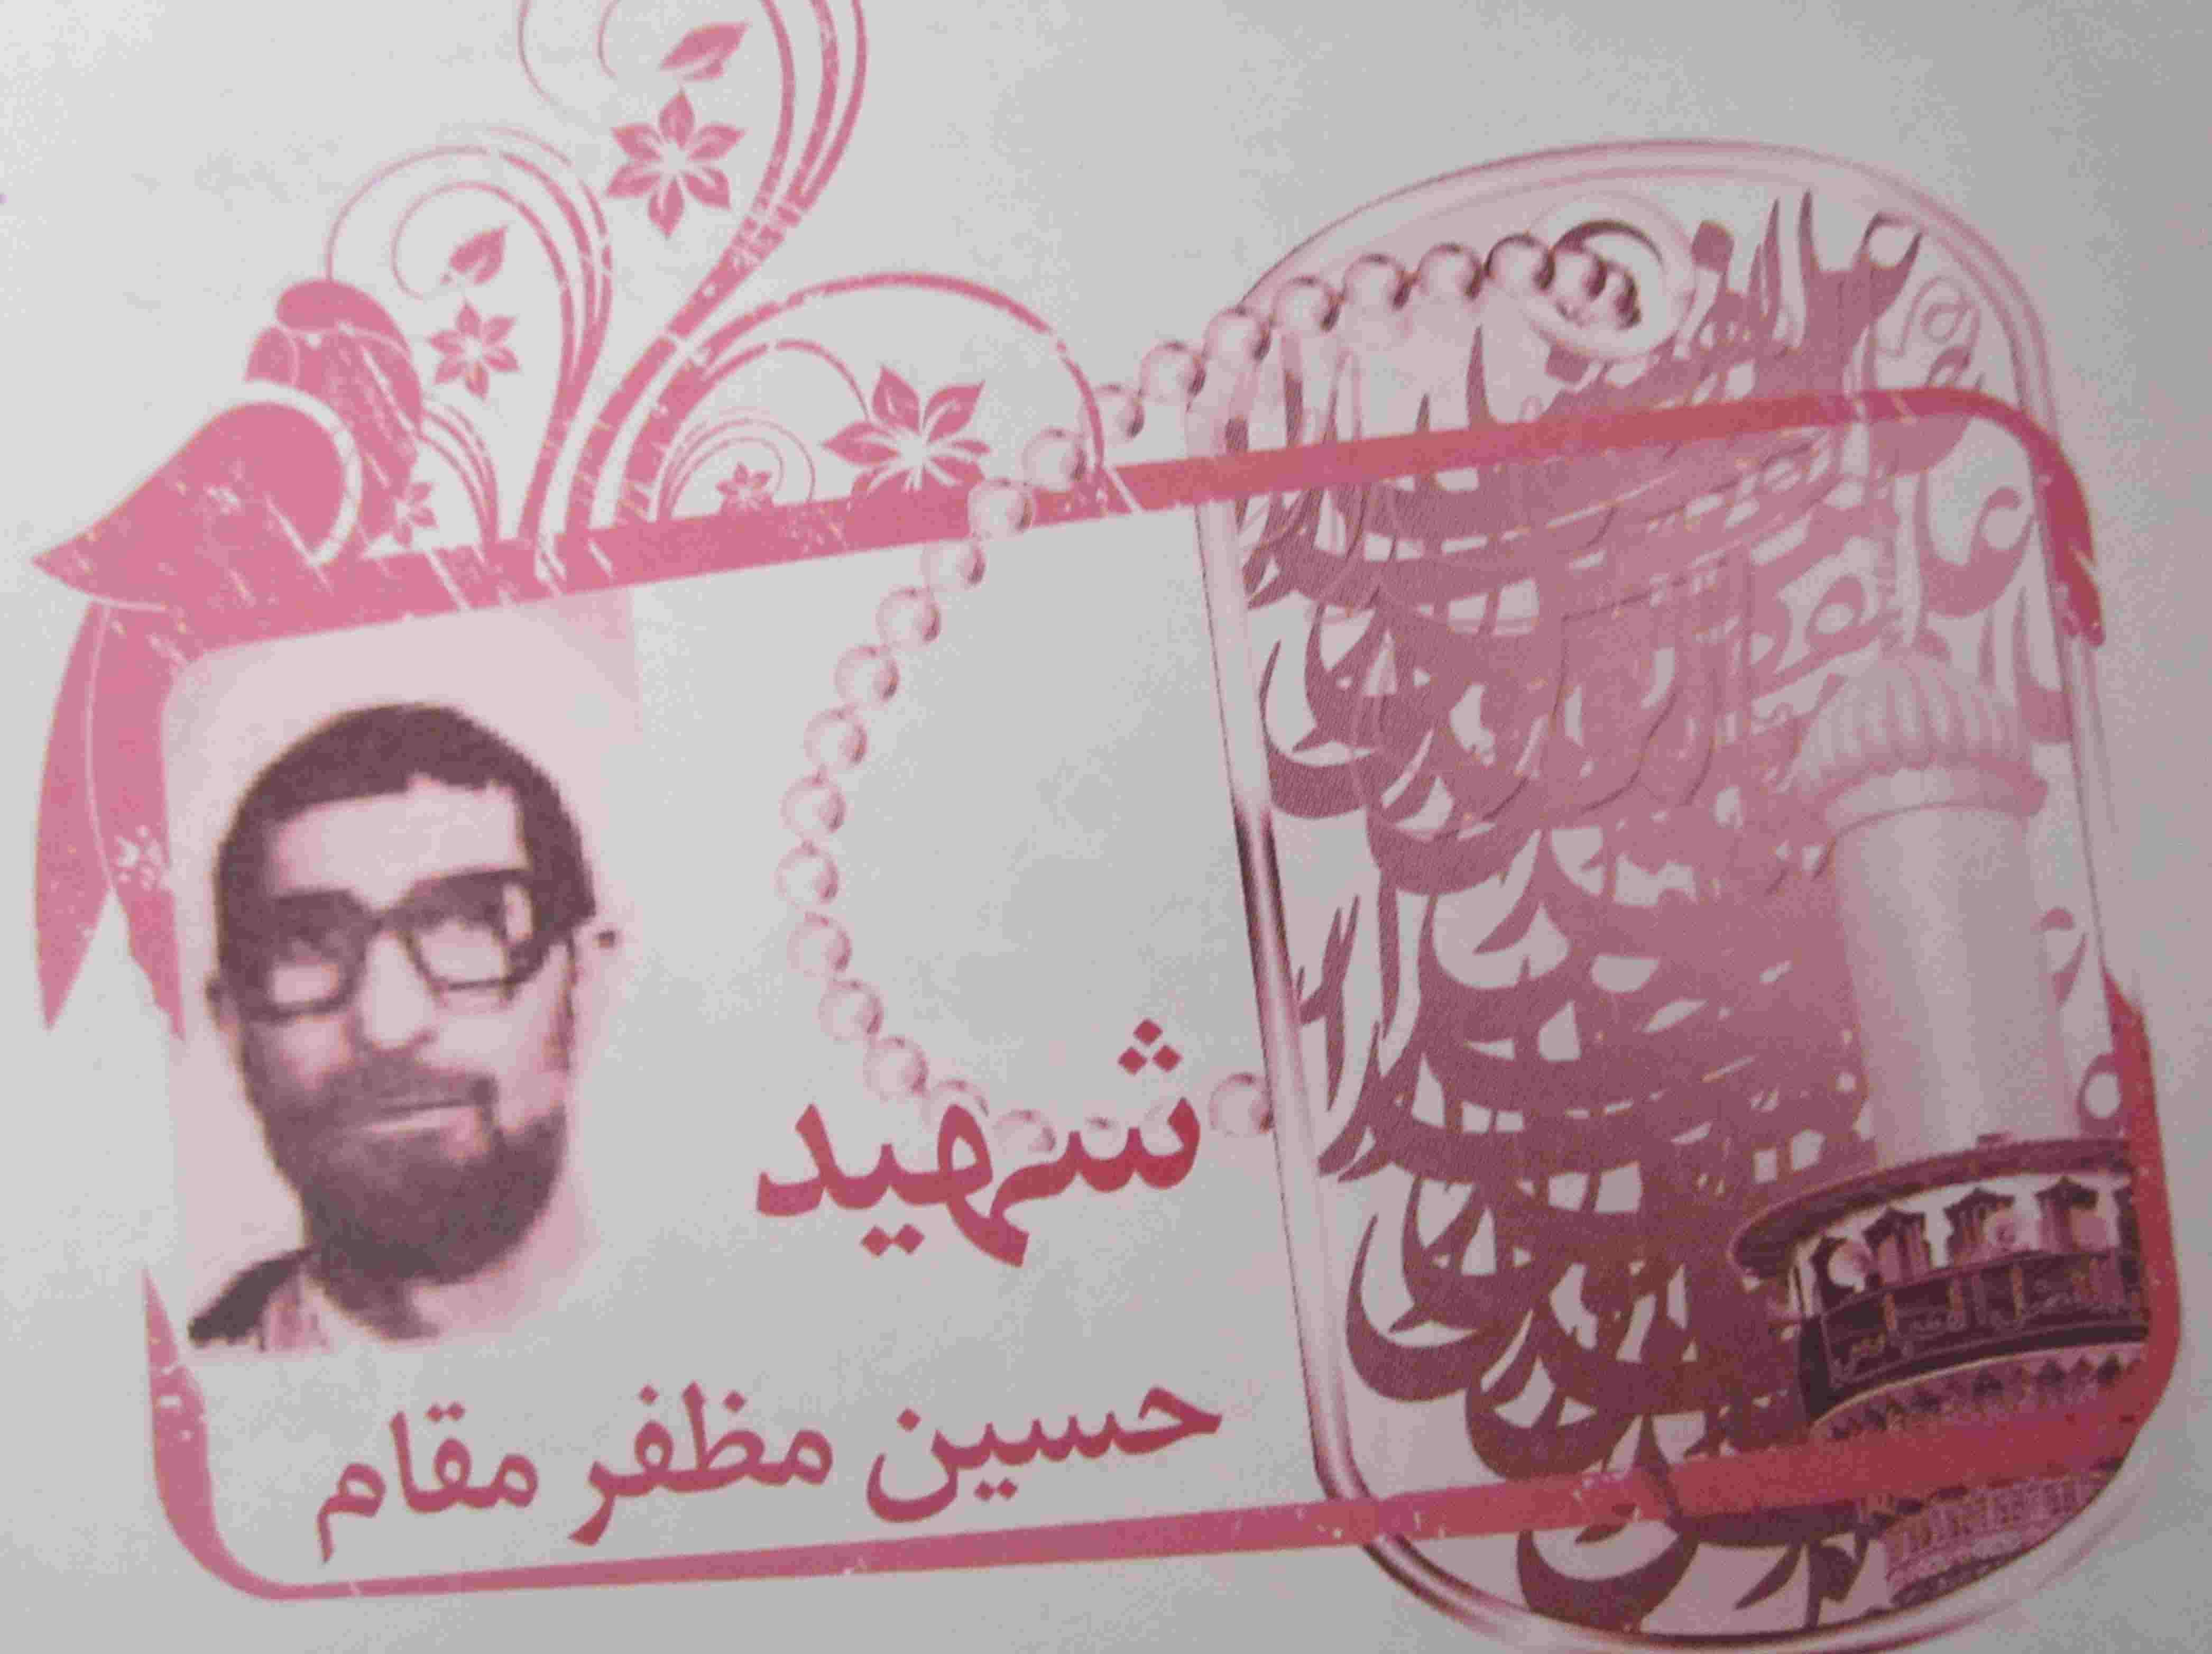 شهید حجت الاسلام حسین مظفرمقام